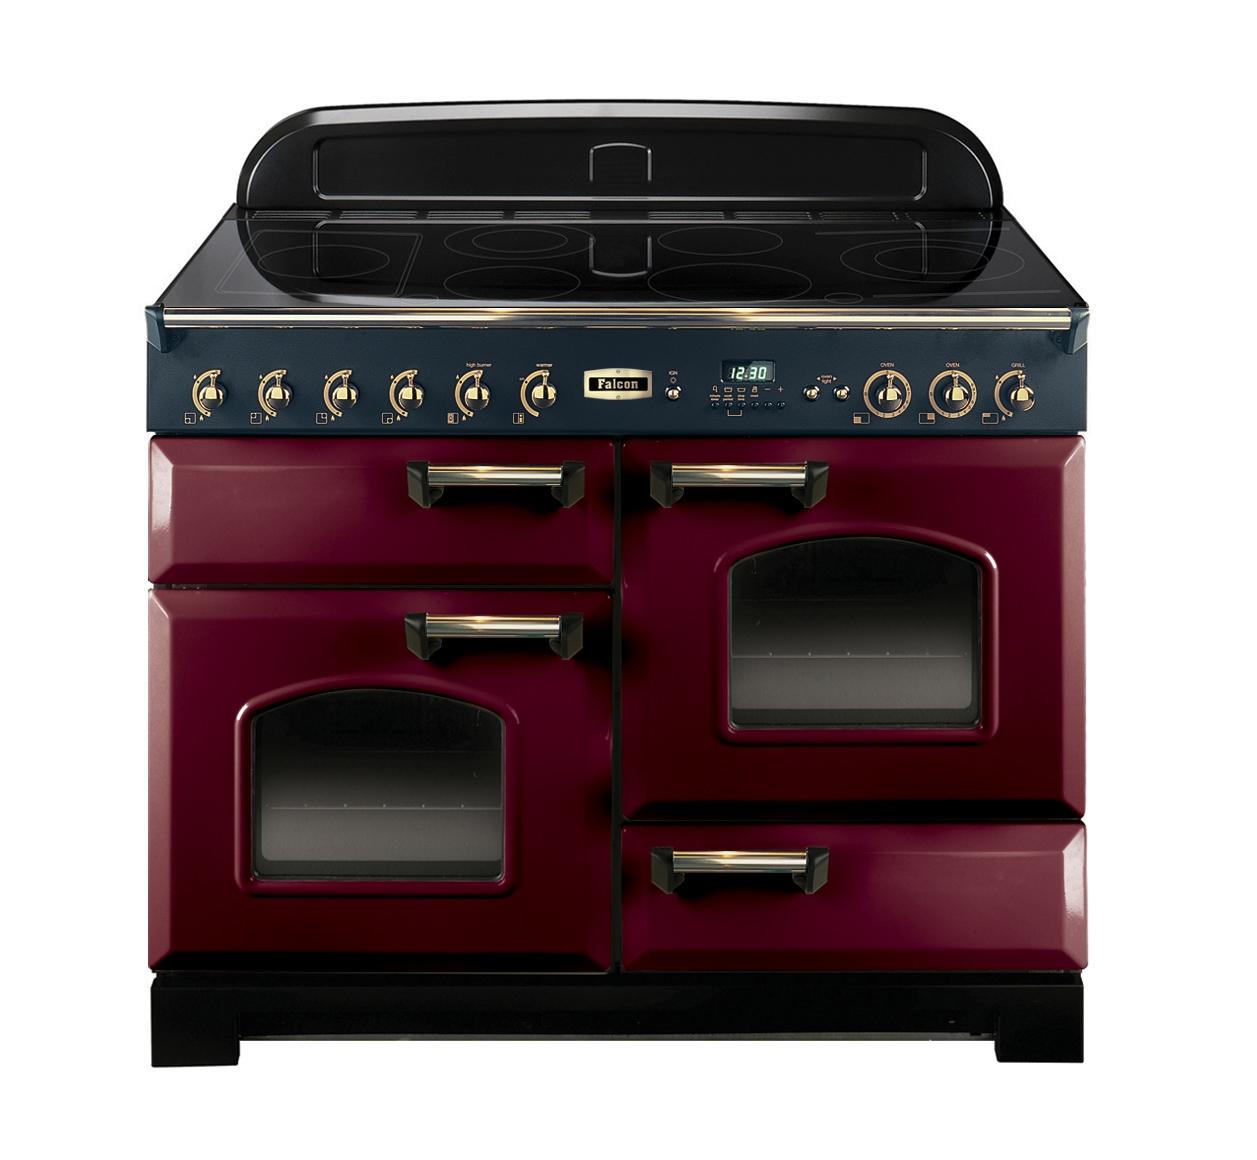 piano de cuisson clas110 induc rouge laiton falcon. Black Bedroom Furniture Sets. Home Design Ideas